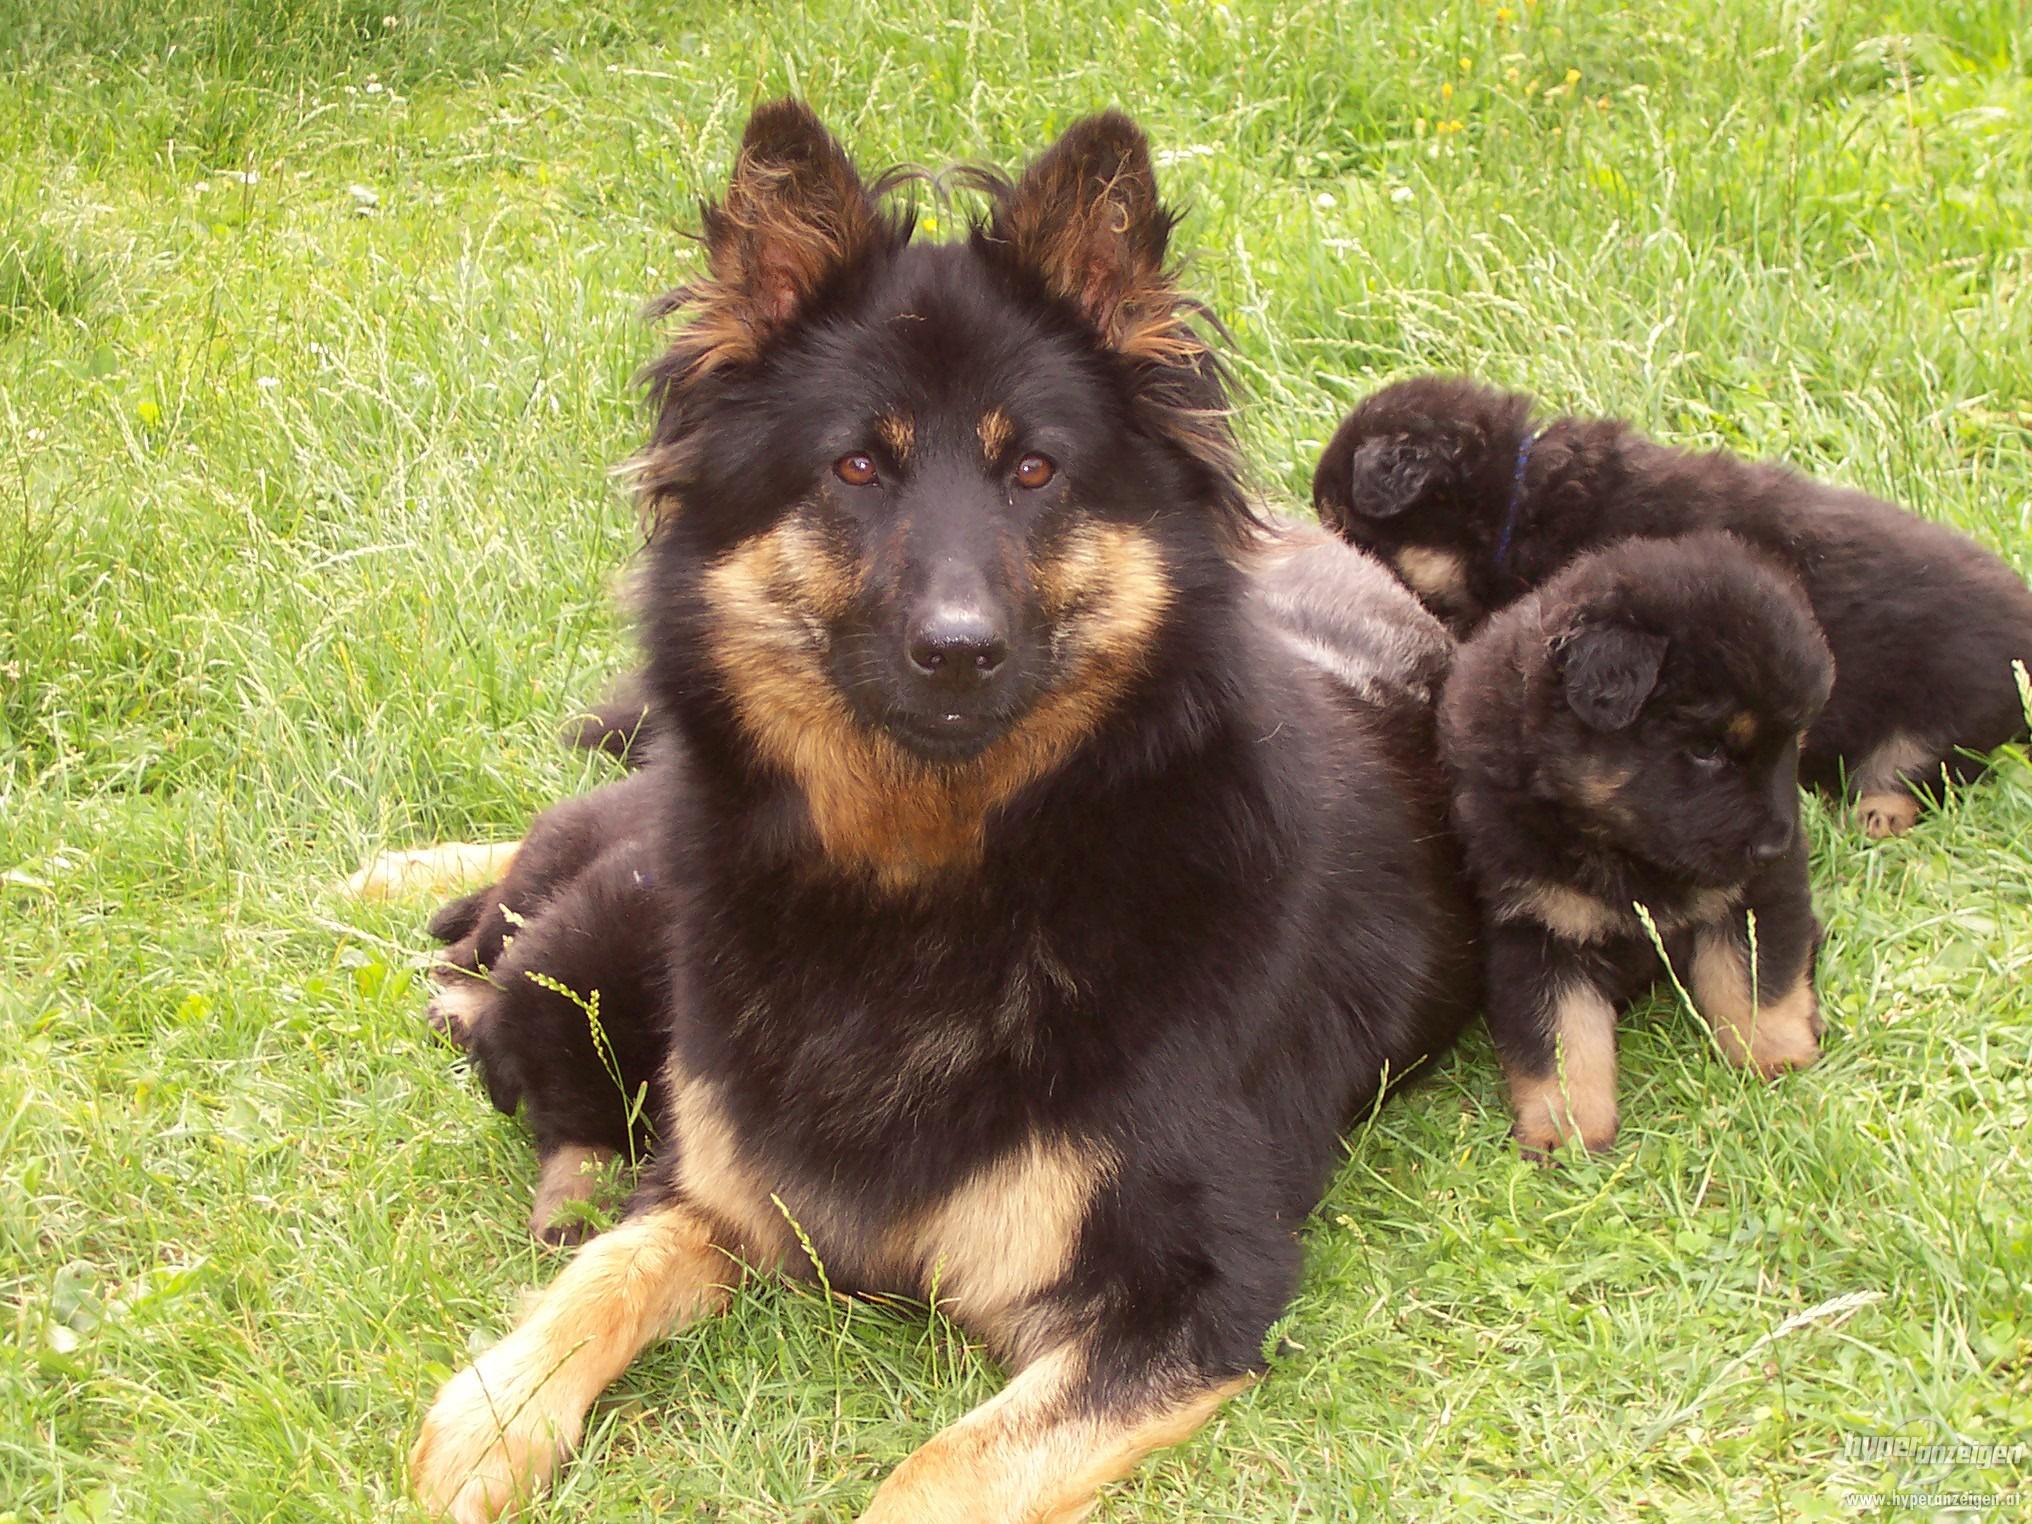 Bohemian Shepherd Puppies: Bohemian Bohemian Dog And Puppies Breed